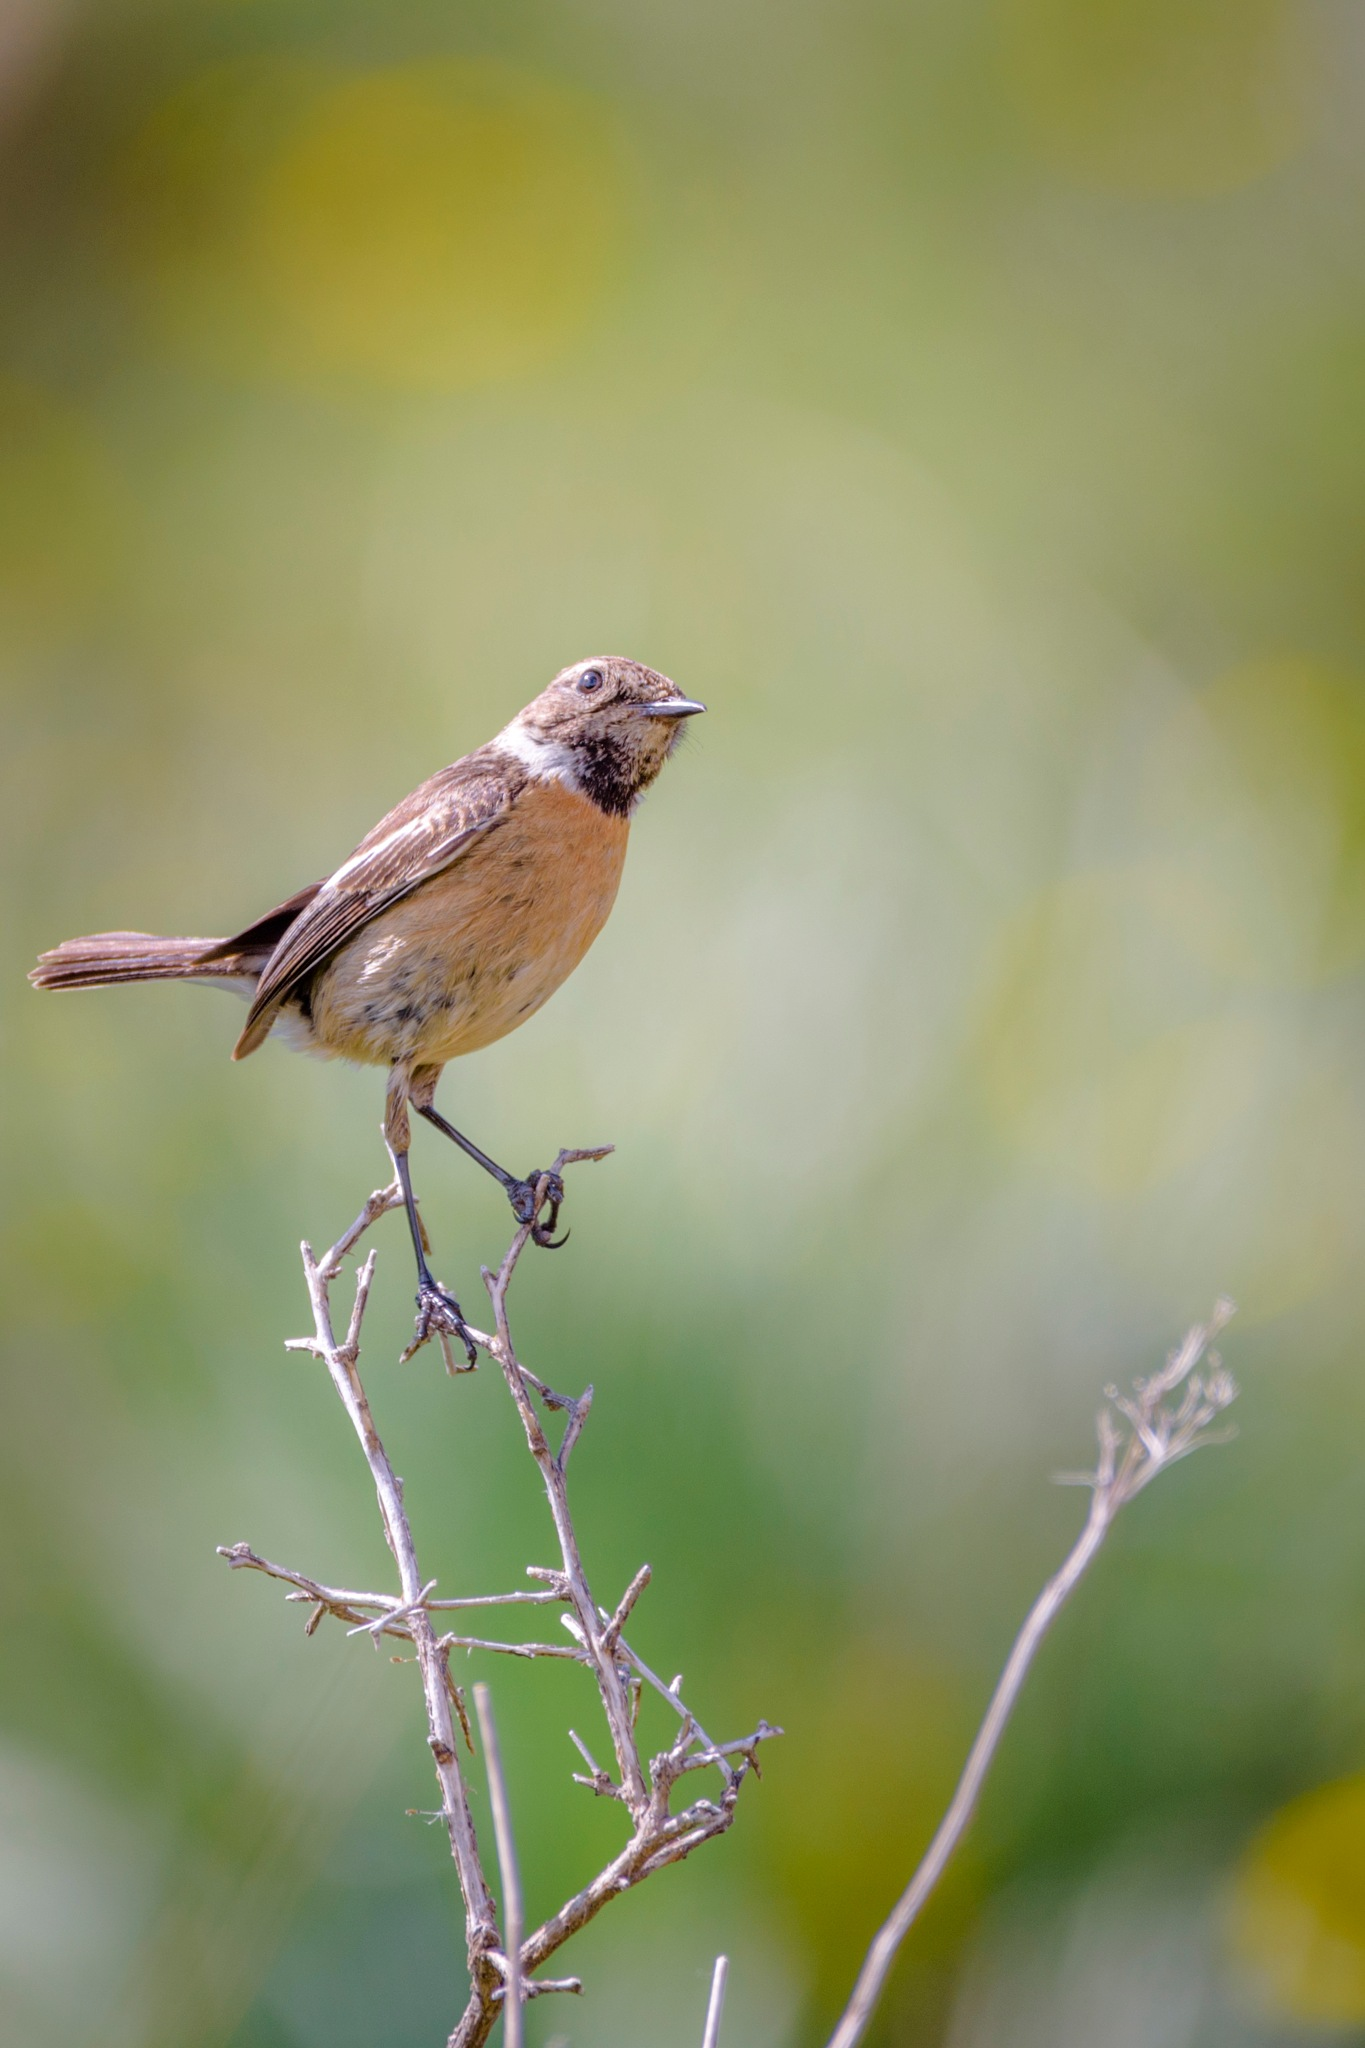 Bird by Noureddine Belfethi